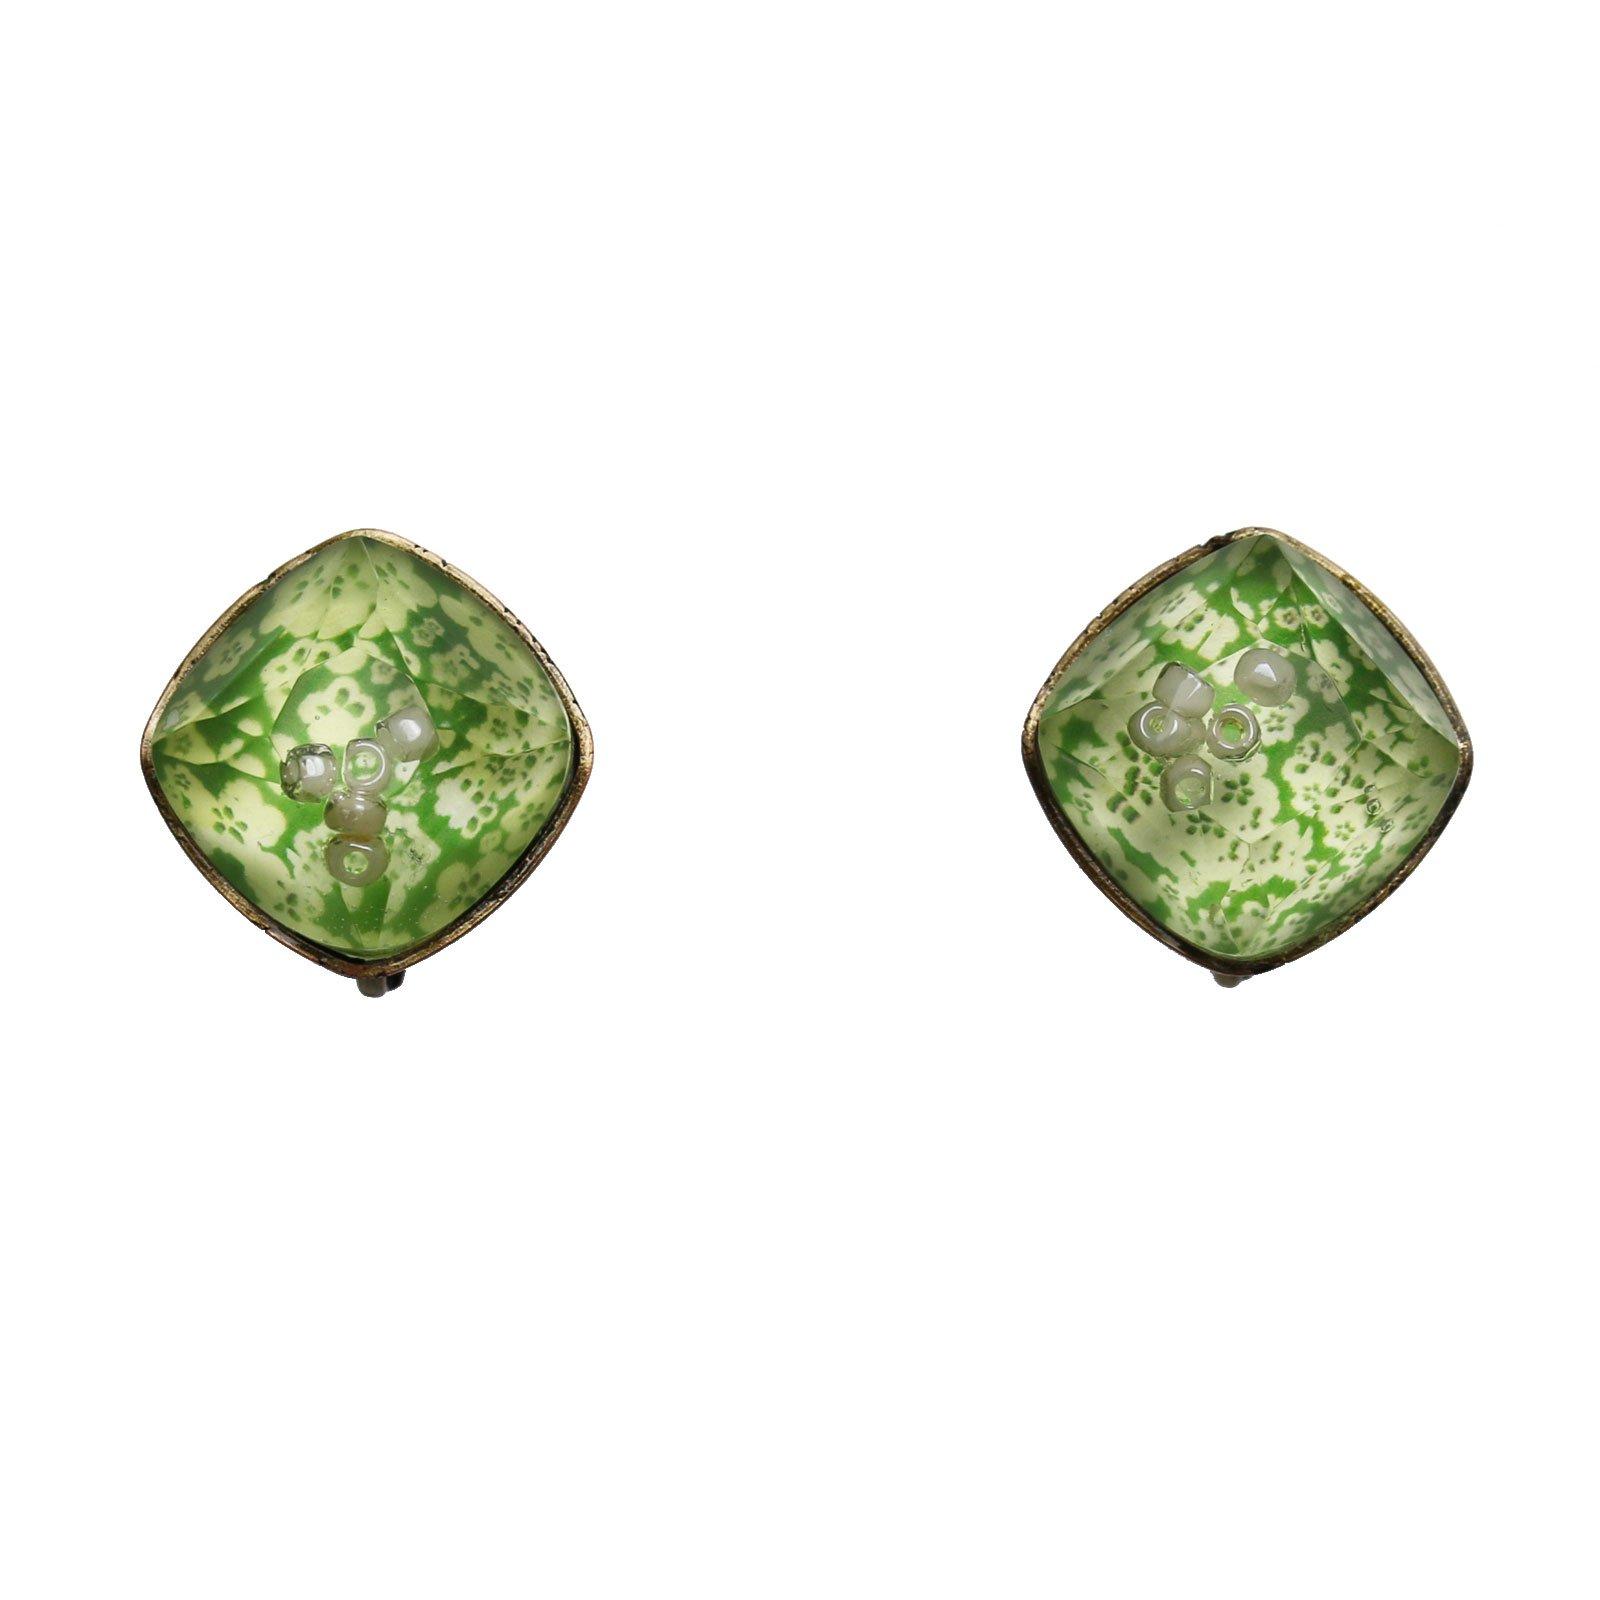 Tamarusan Earring Clip Type Screw Type Hand Made Resin Plum Green Tea by TAMARUSAN